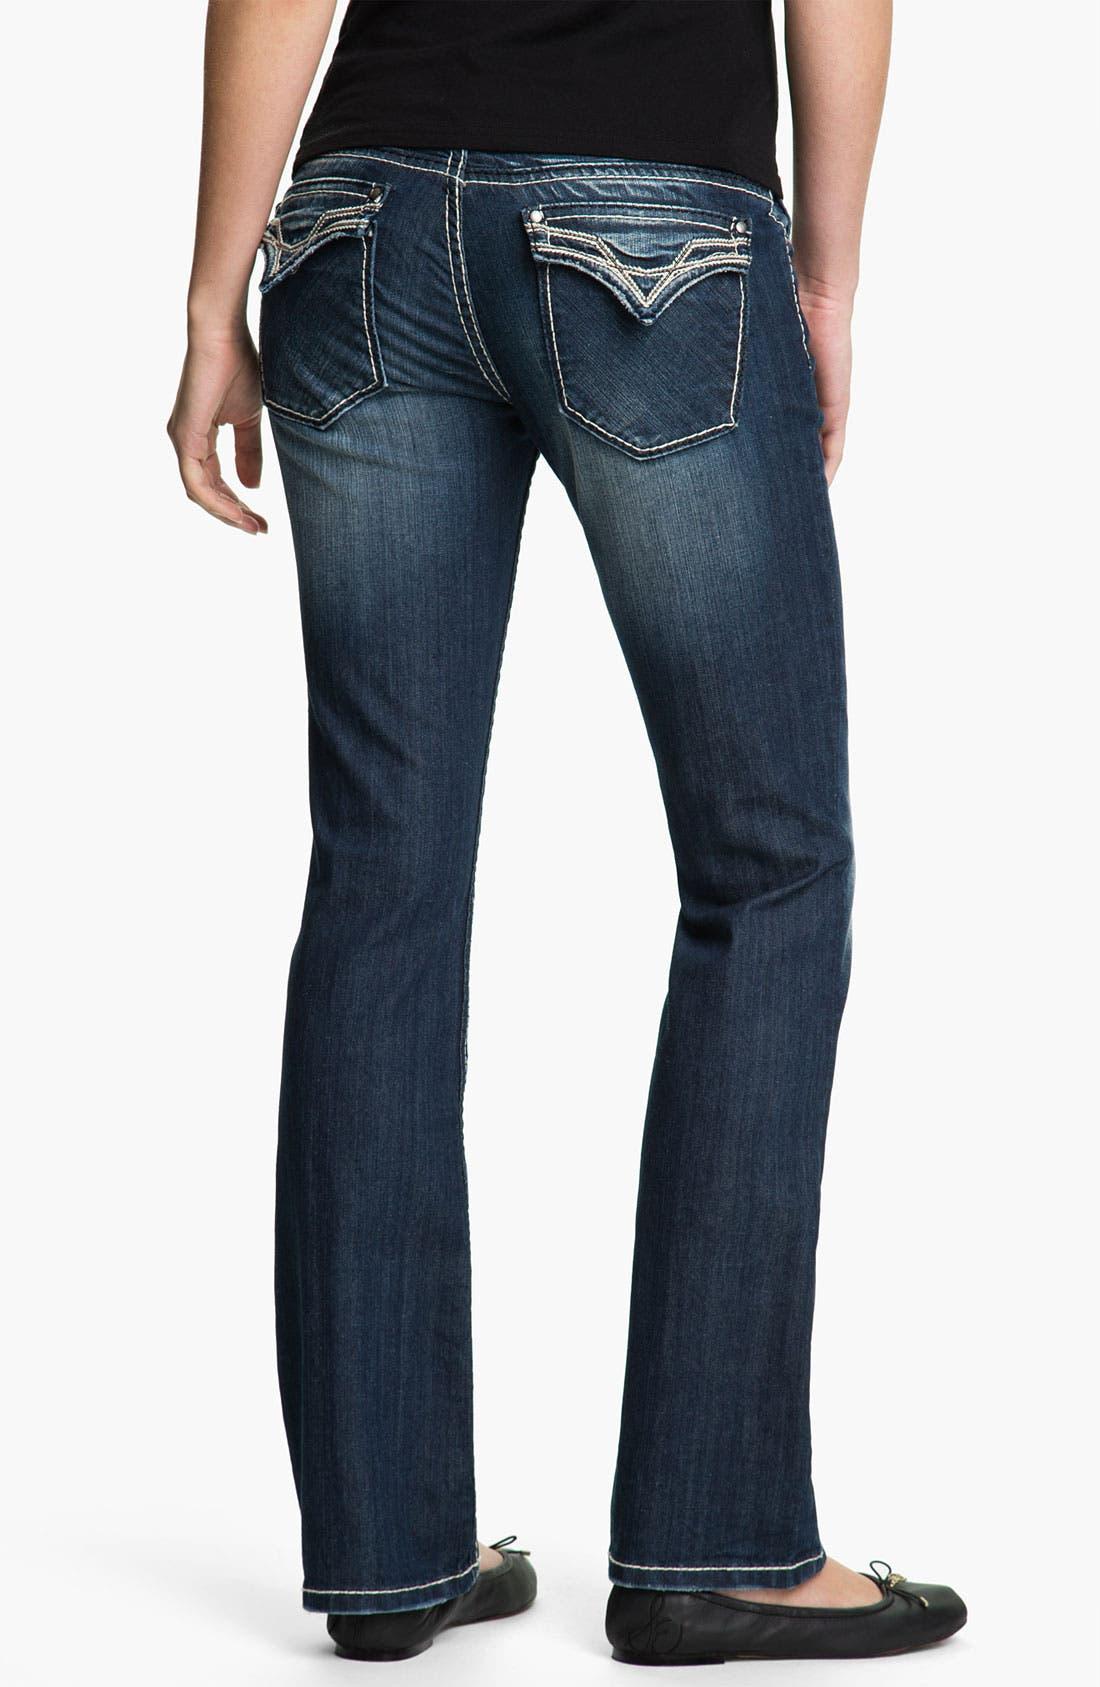 Alternate Image 1 Selected - Vigoss Embroidered Pocket Bootcut Jeans (Juniors)